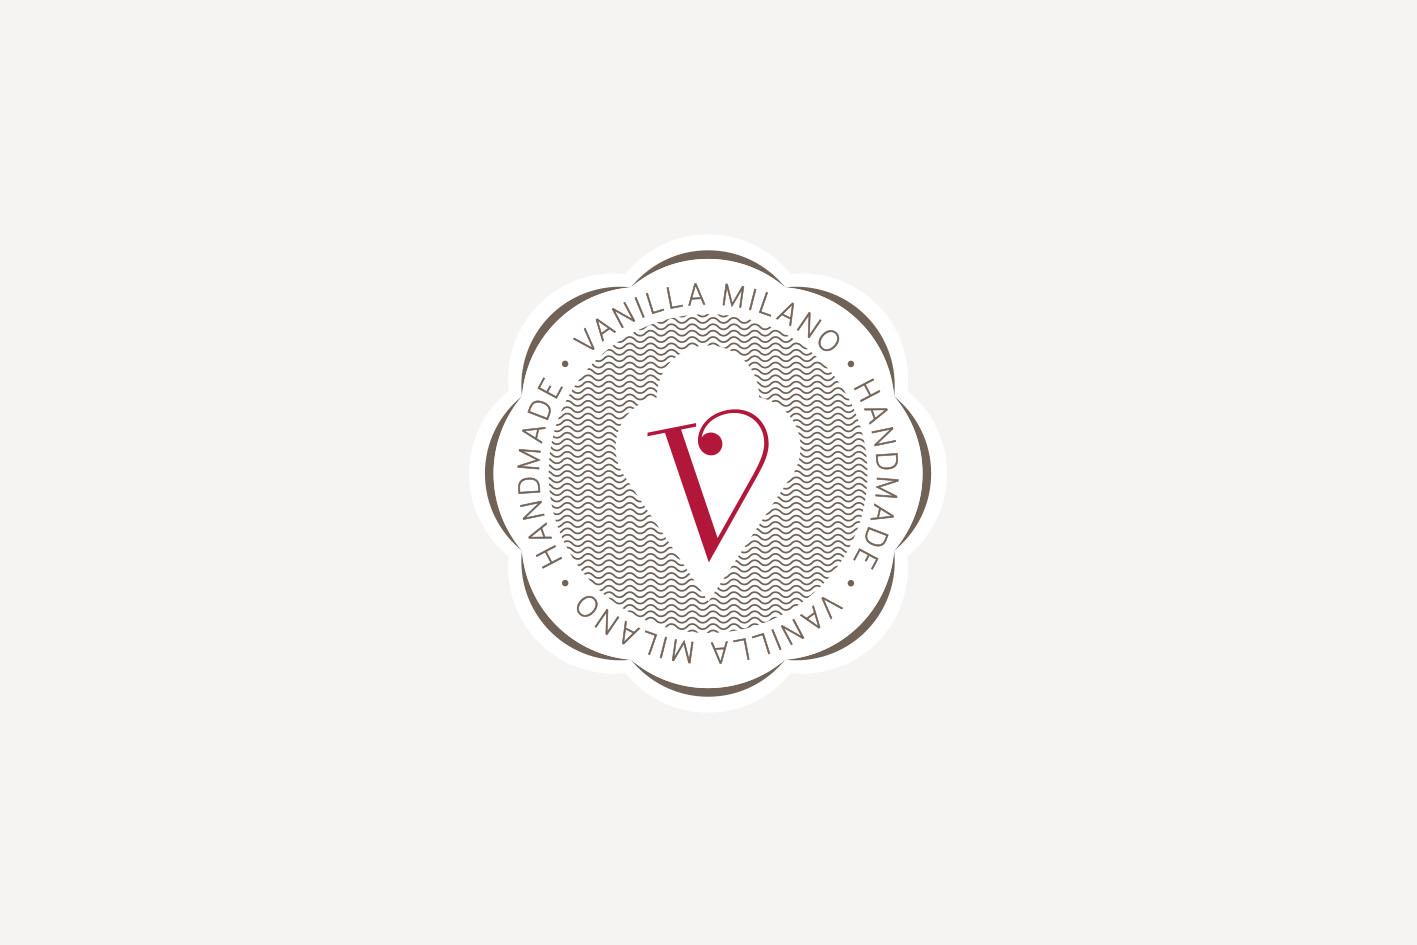 2015_vm_marchio_web